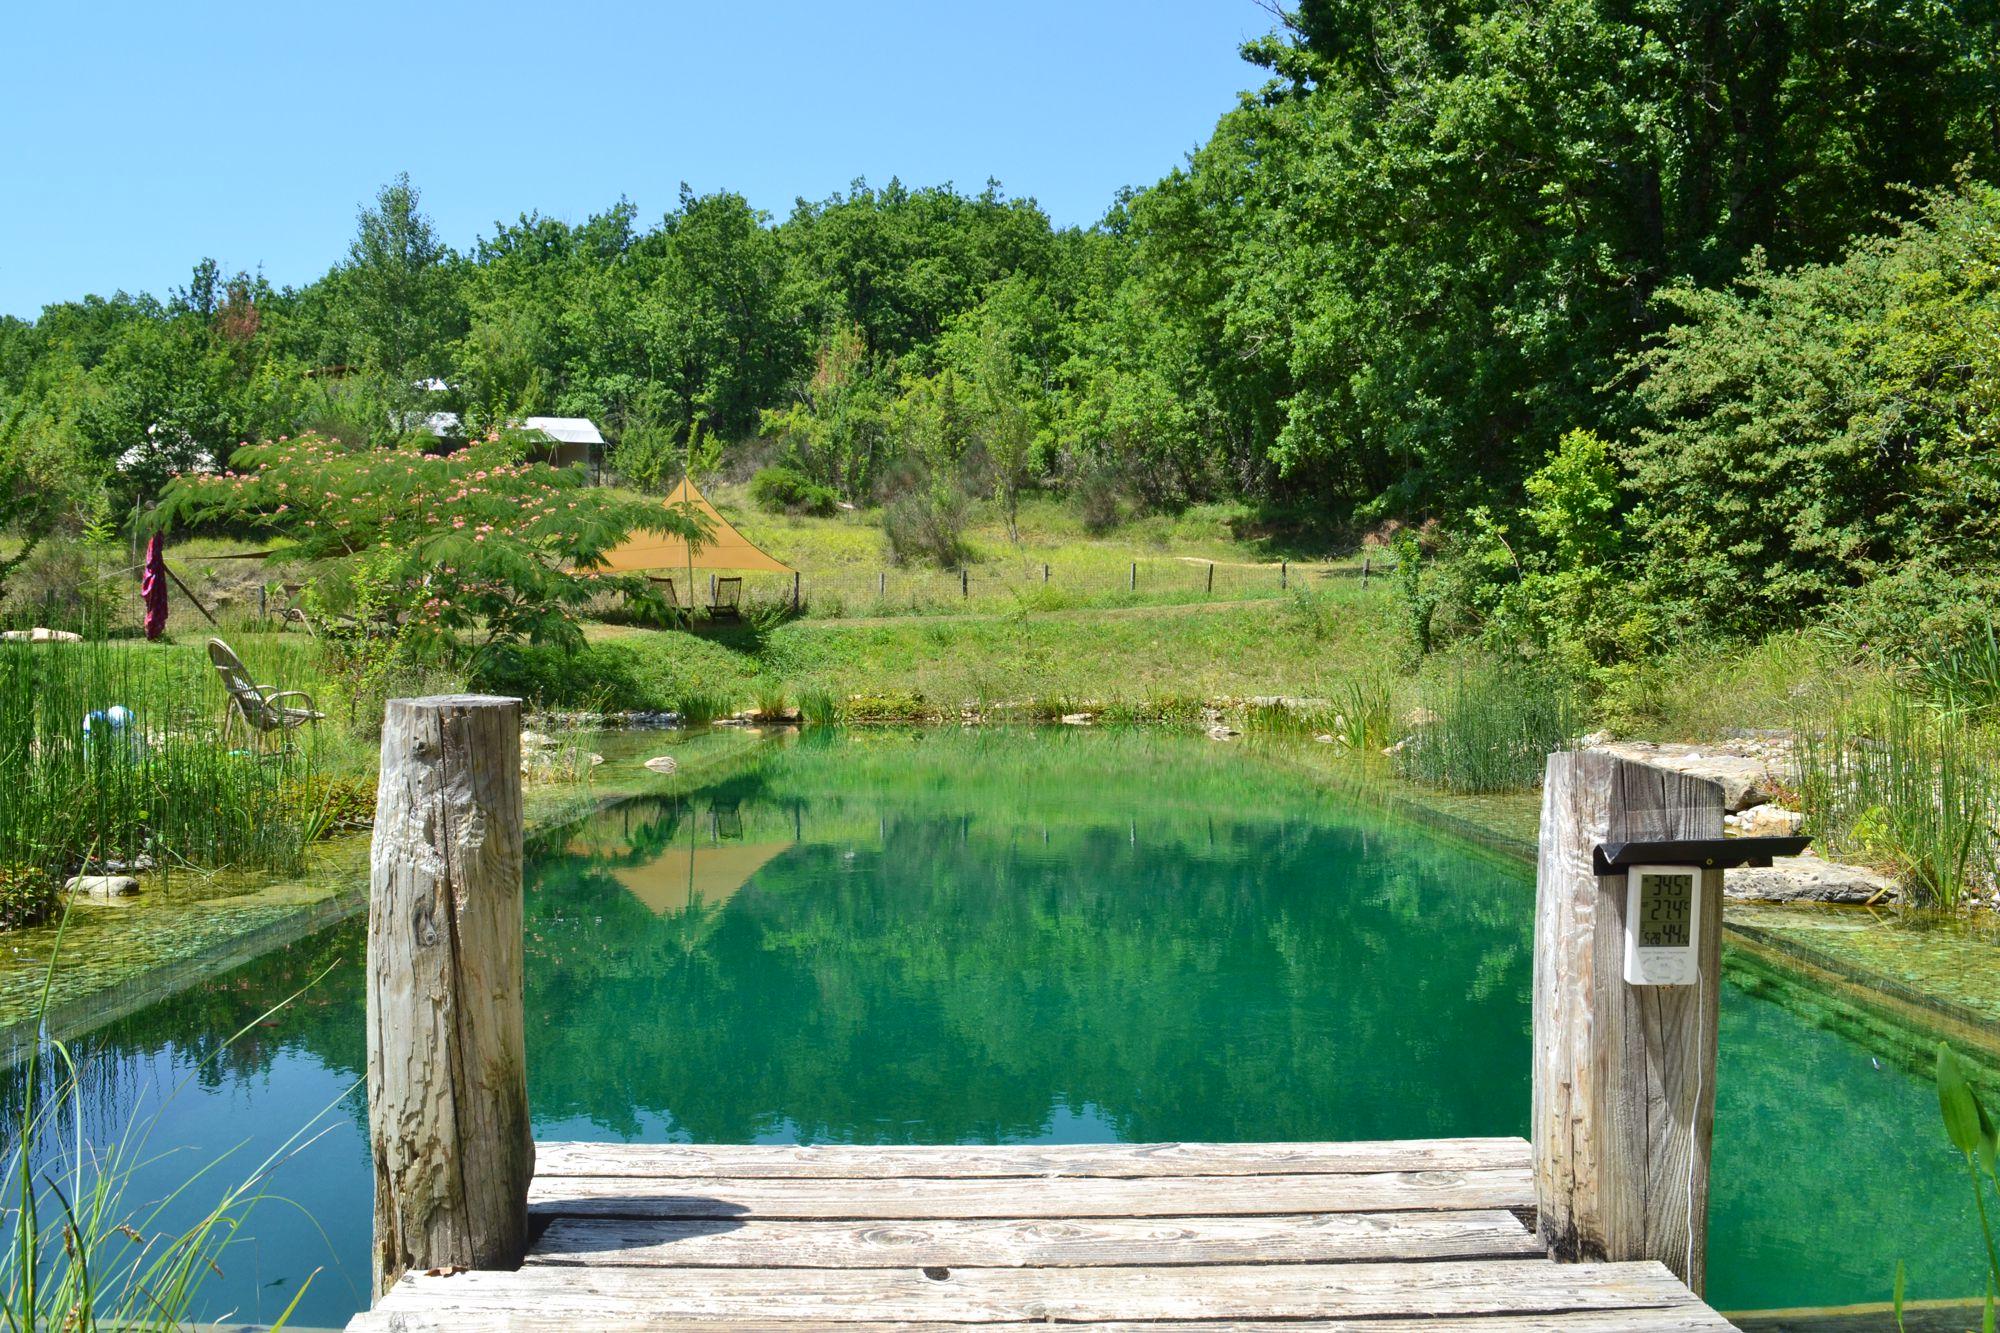 Campsites in Tarn-et-Garonne holidays at I Love This Campsite